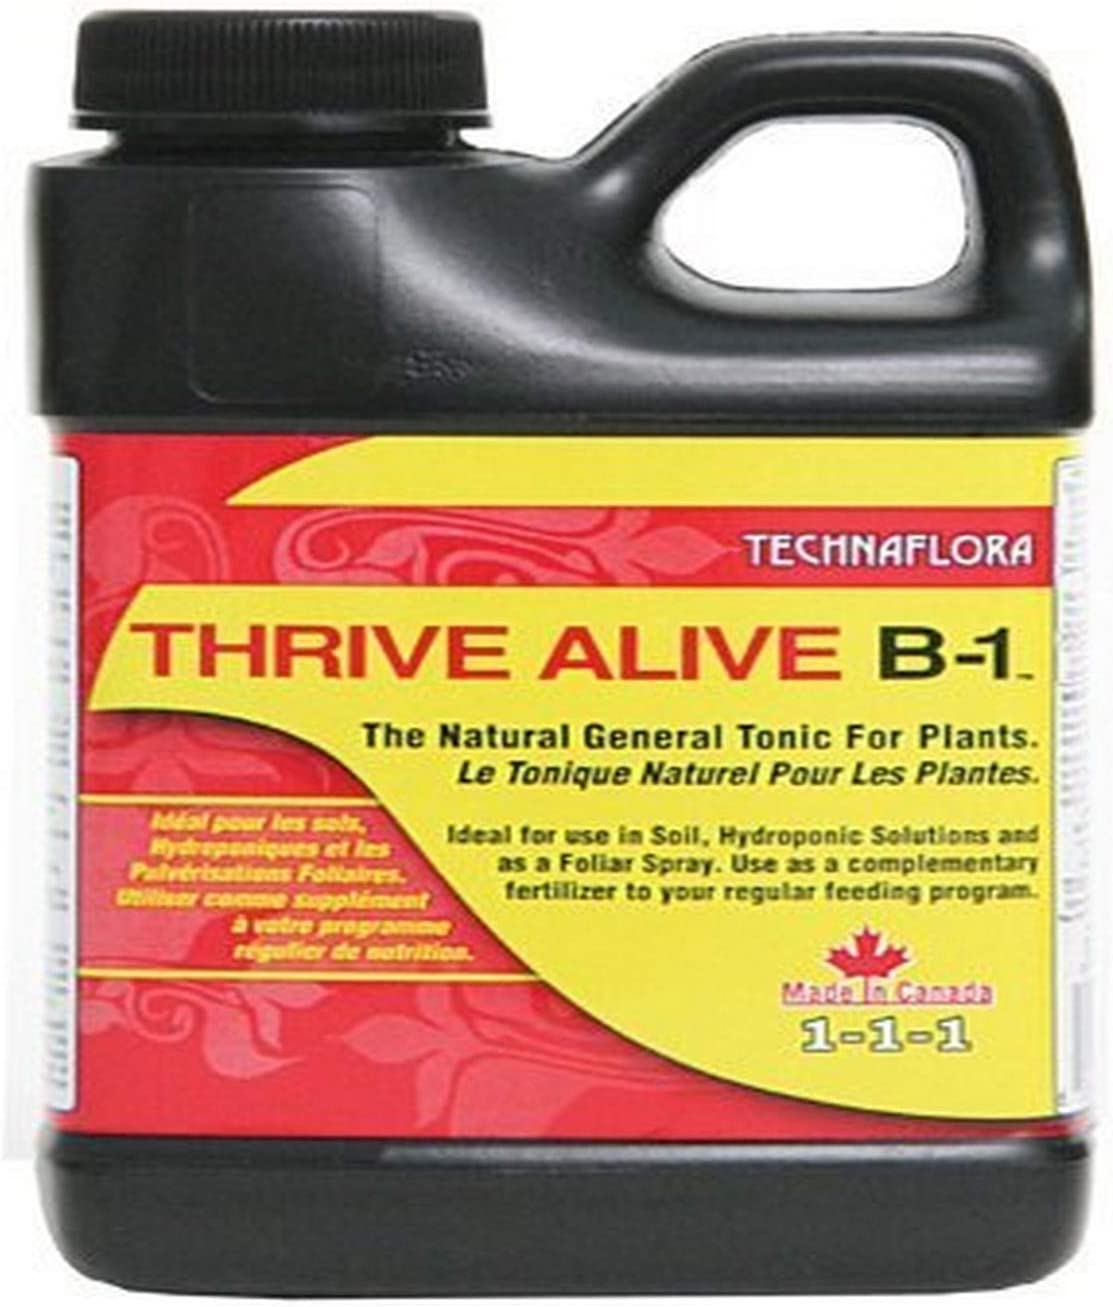 Technaflora 720605 Fertilizer Ranking TOP13 Finally popular brand Liter Red 0.25